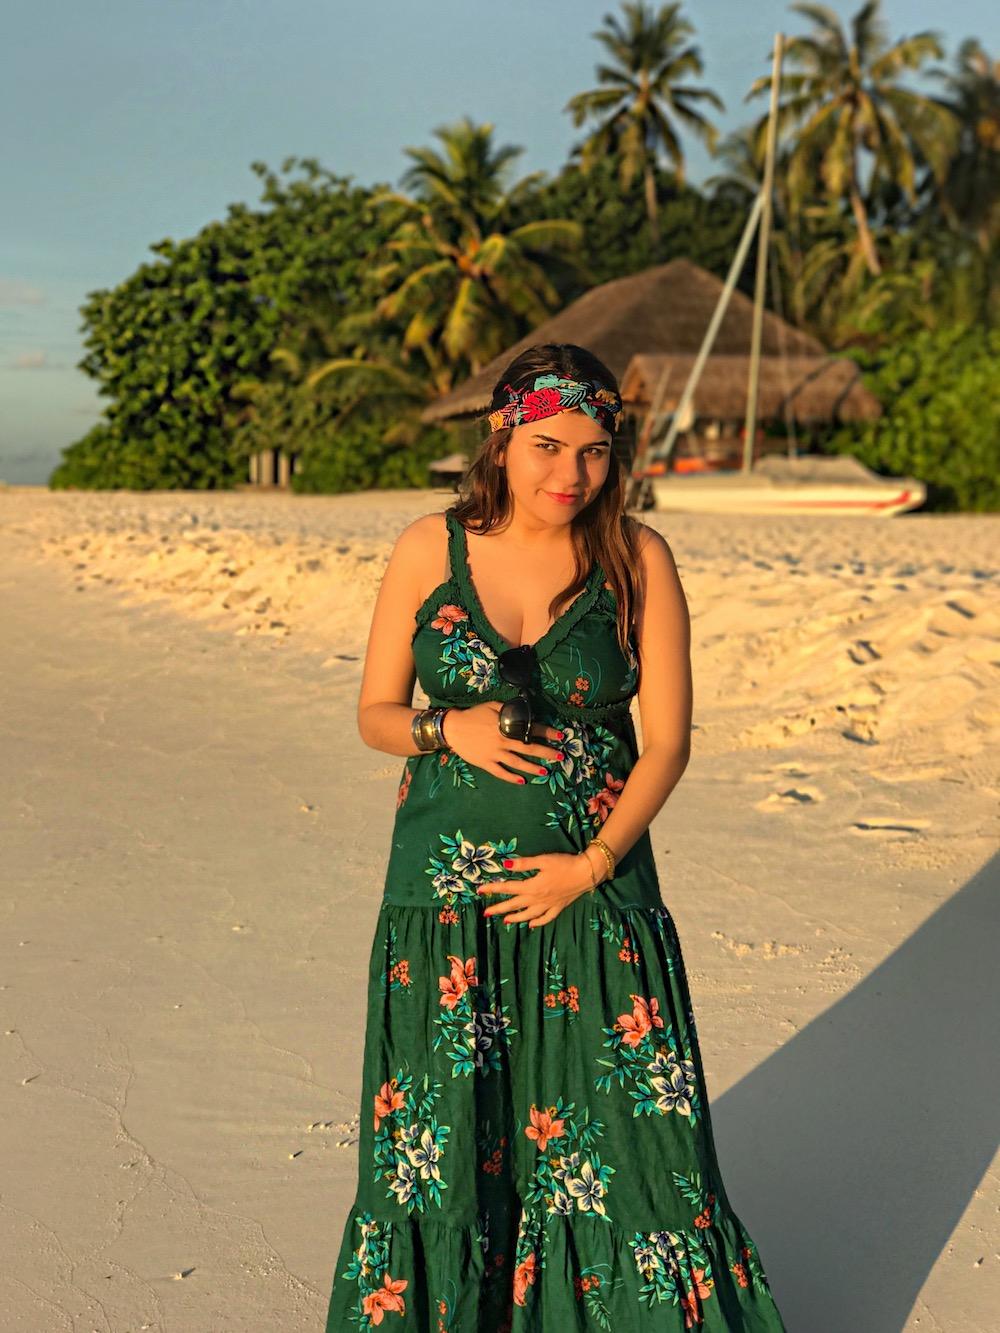 alley-girl-pregnant-photos-alley-girl-fashion-travel-life-style-blog